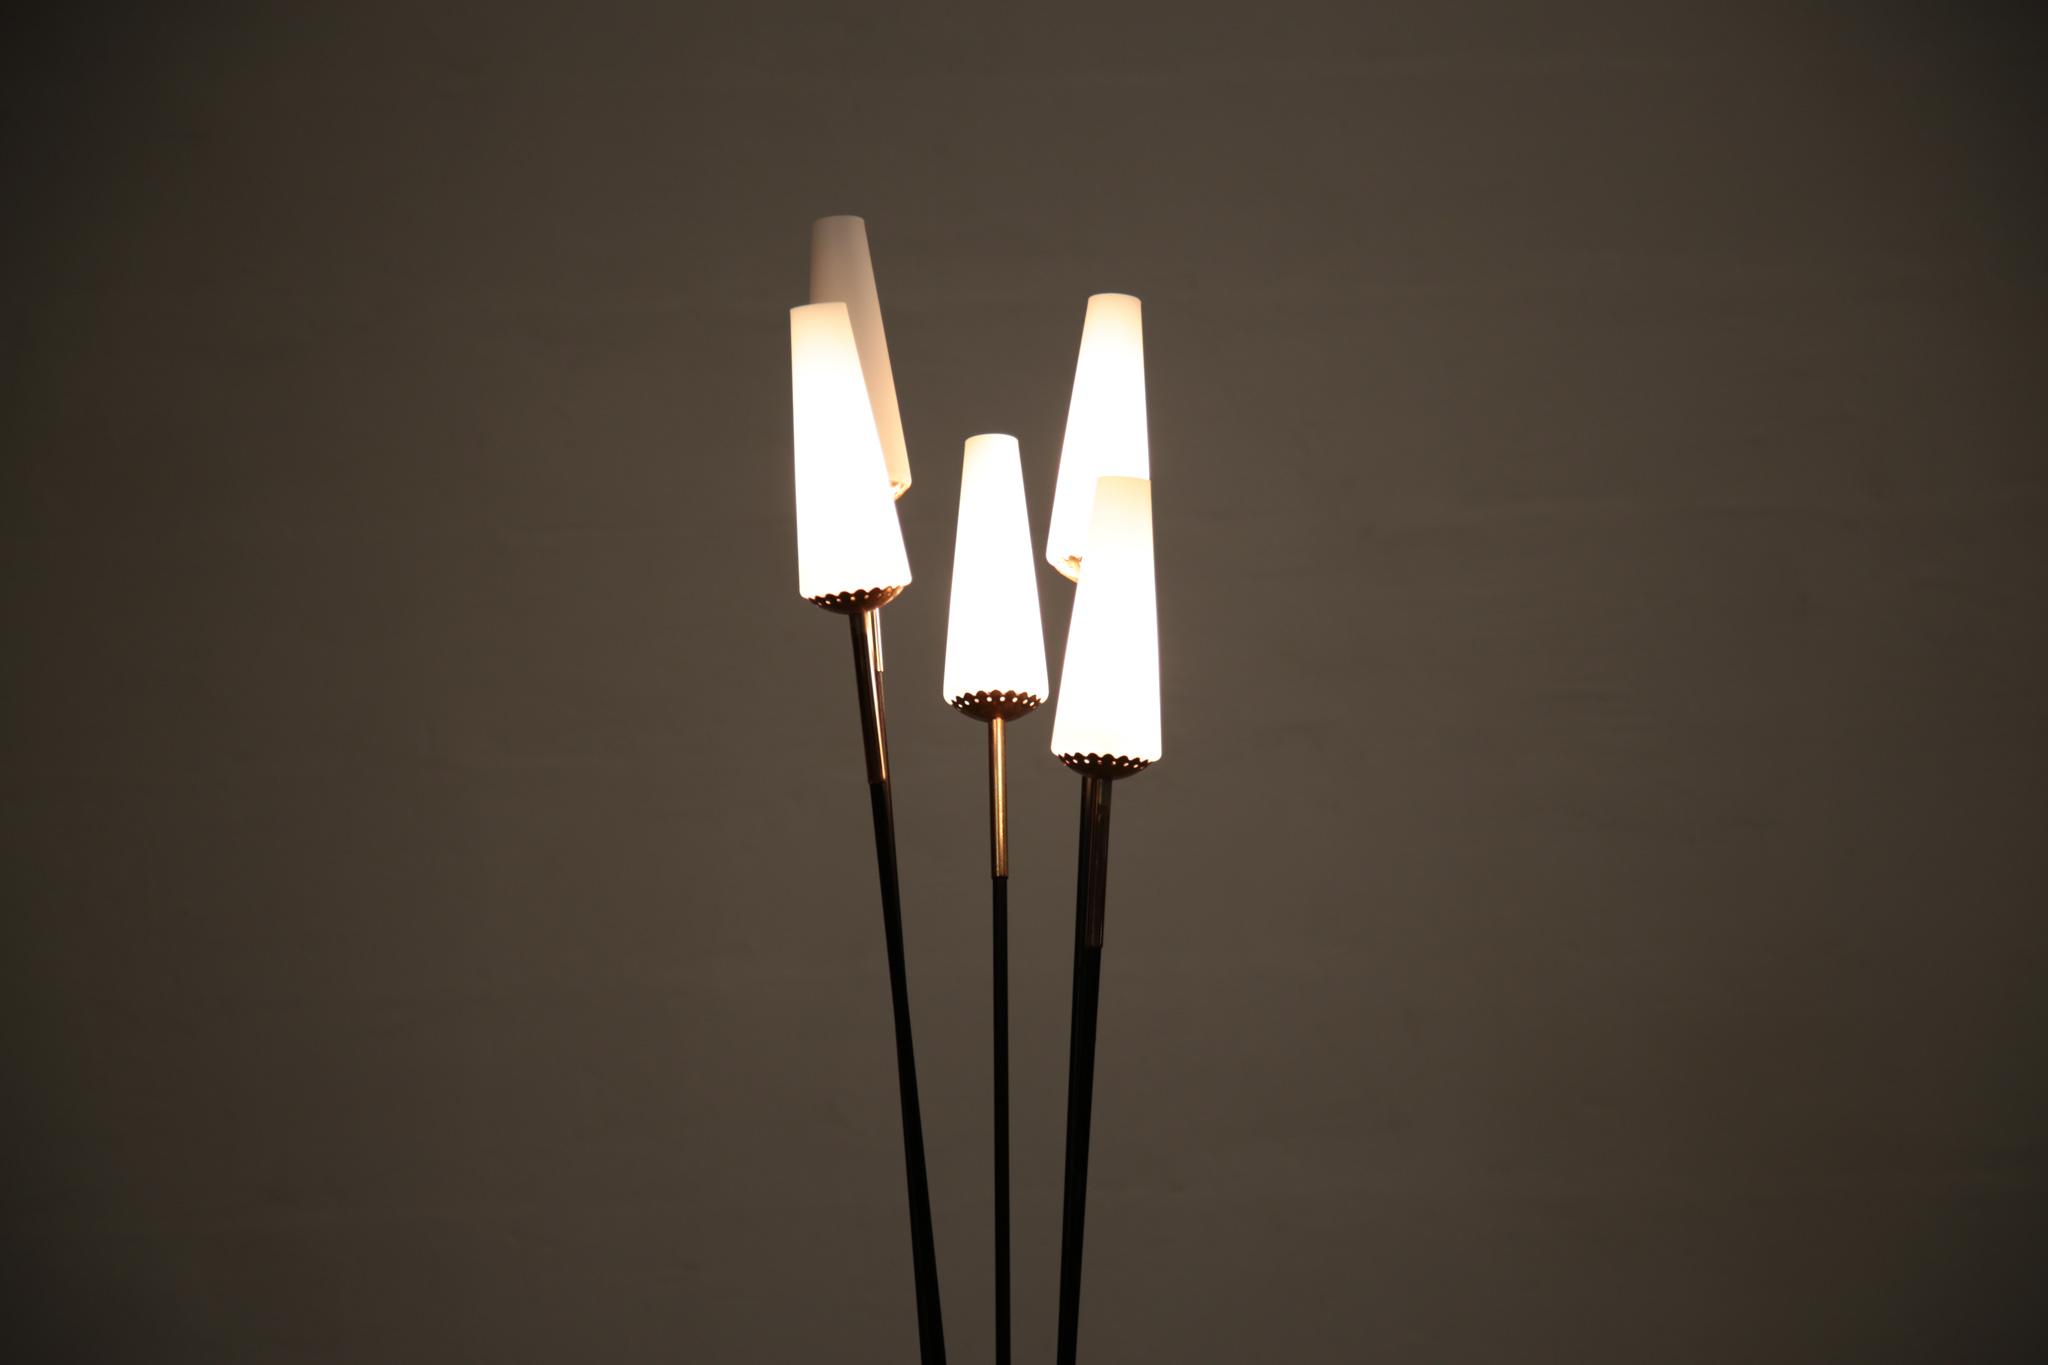 lampadaire design italien vintage opaline danke galerie. Black Bedroom Furniture Sets. Home Design Ideas